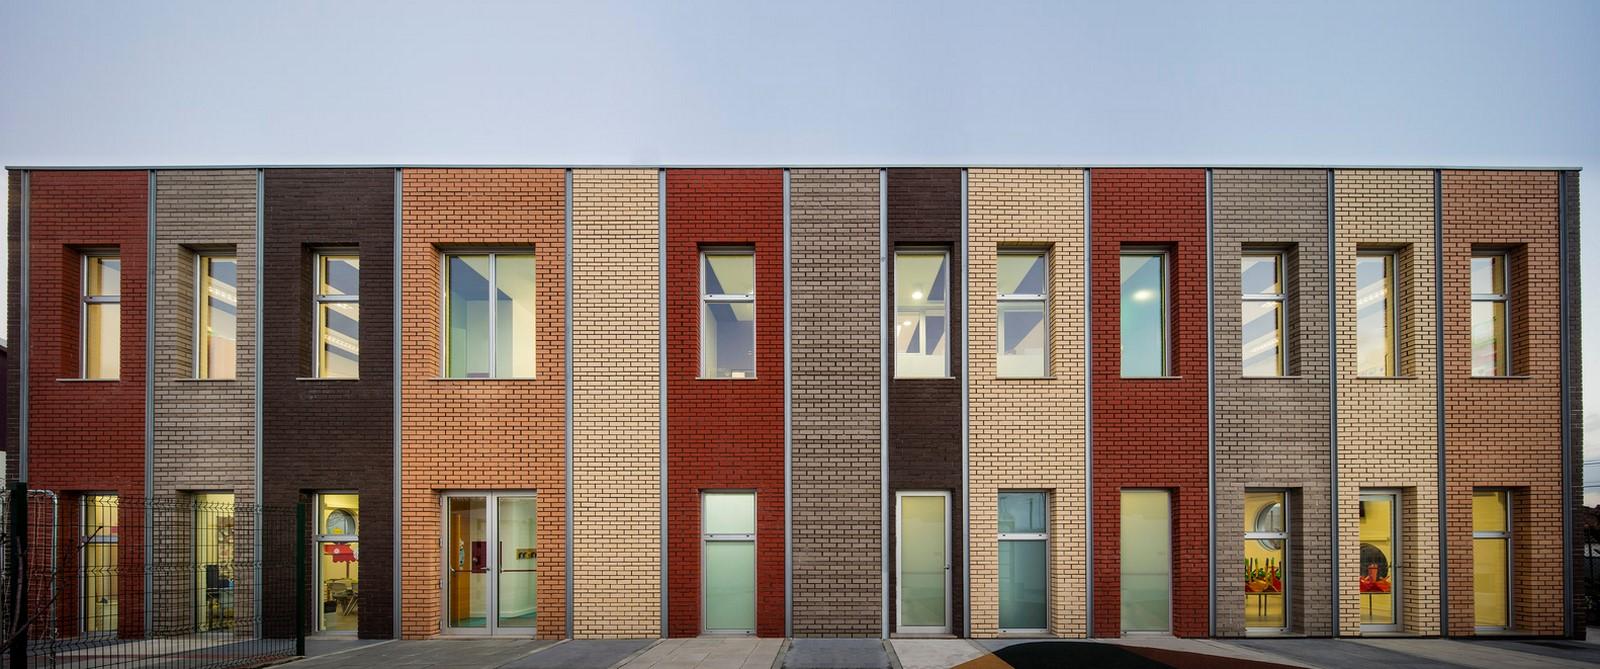 Coloured Bricks - Sheet1